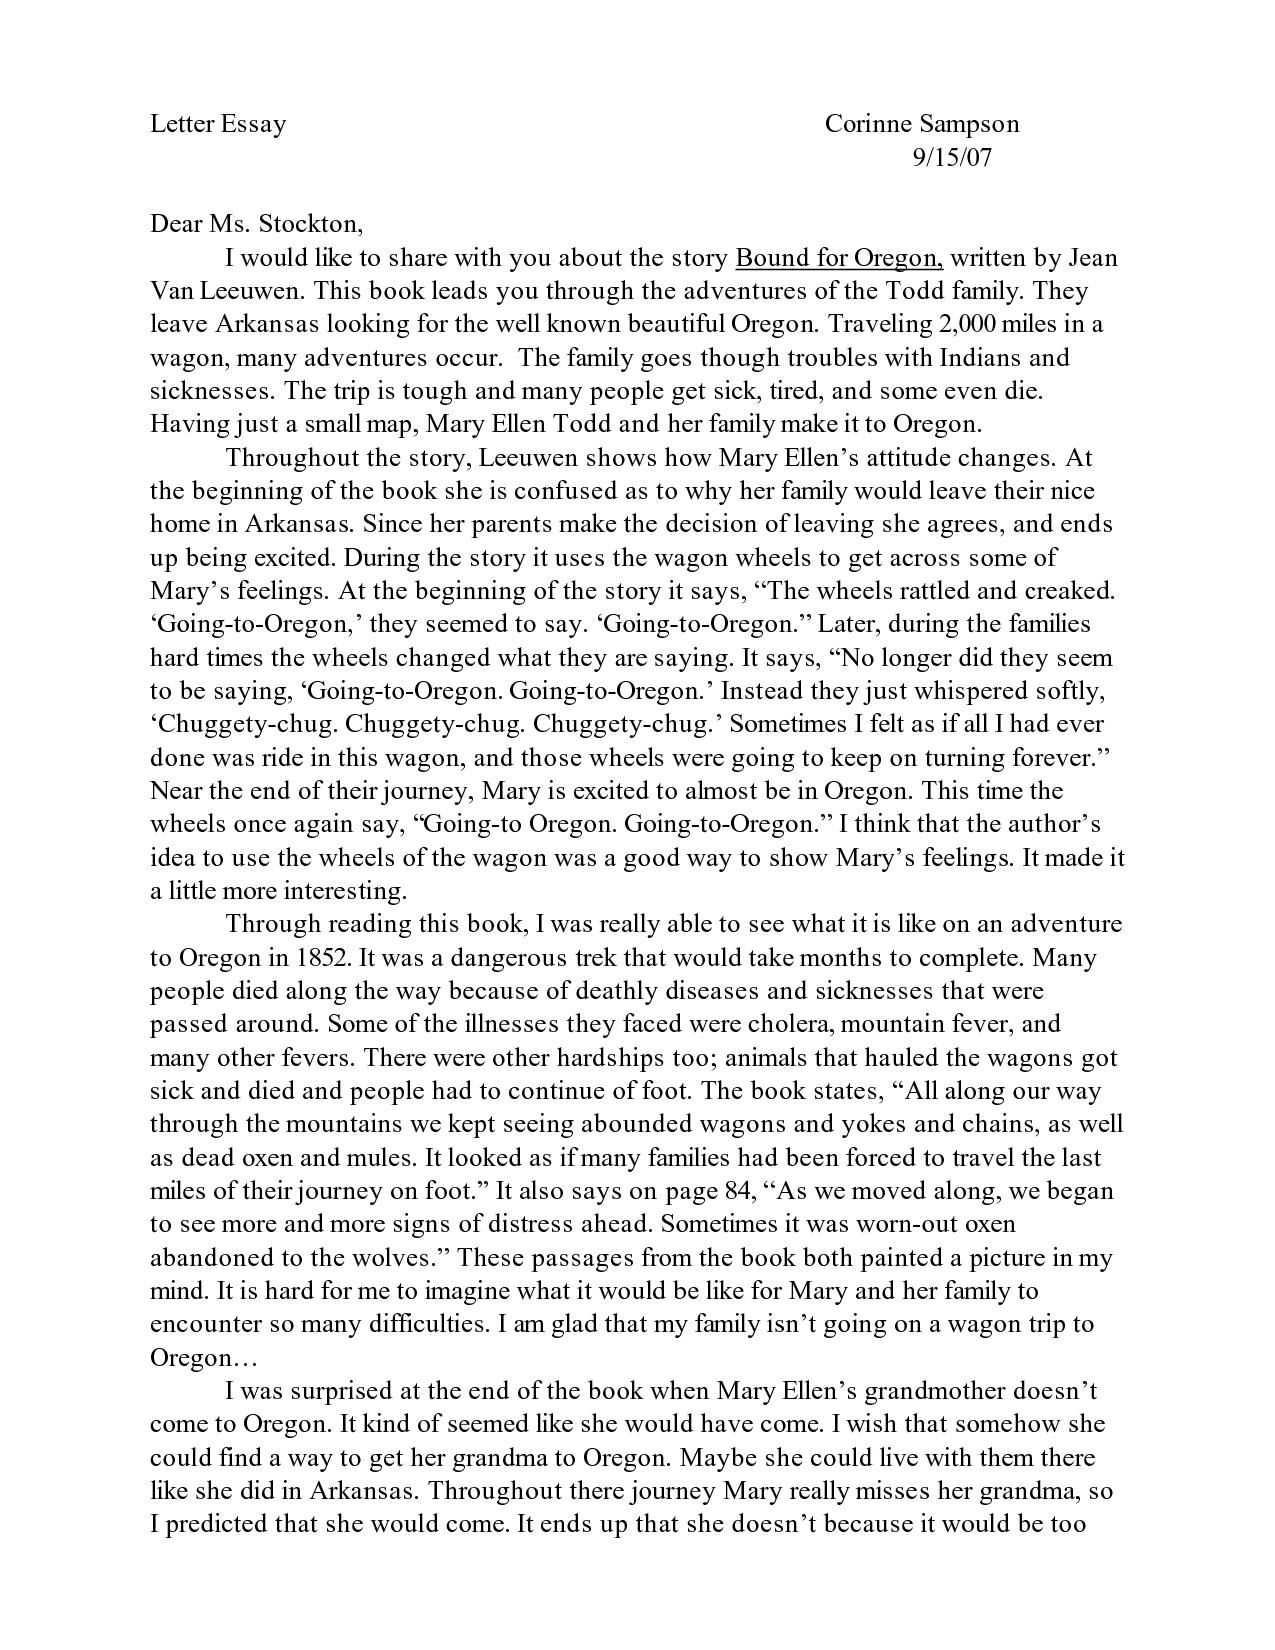 Samples Of Scholarship Essays For College Scholarship Essay Help Best Photos Of Winning College Sch Scholarship Essay Examples Essay Examples Scholarship Essay